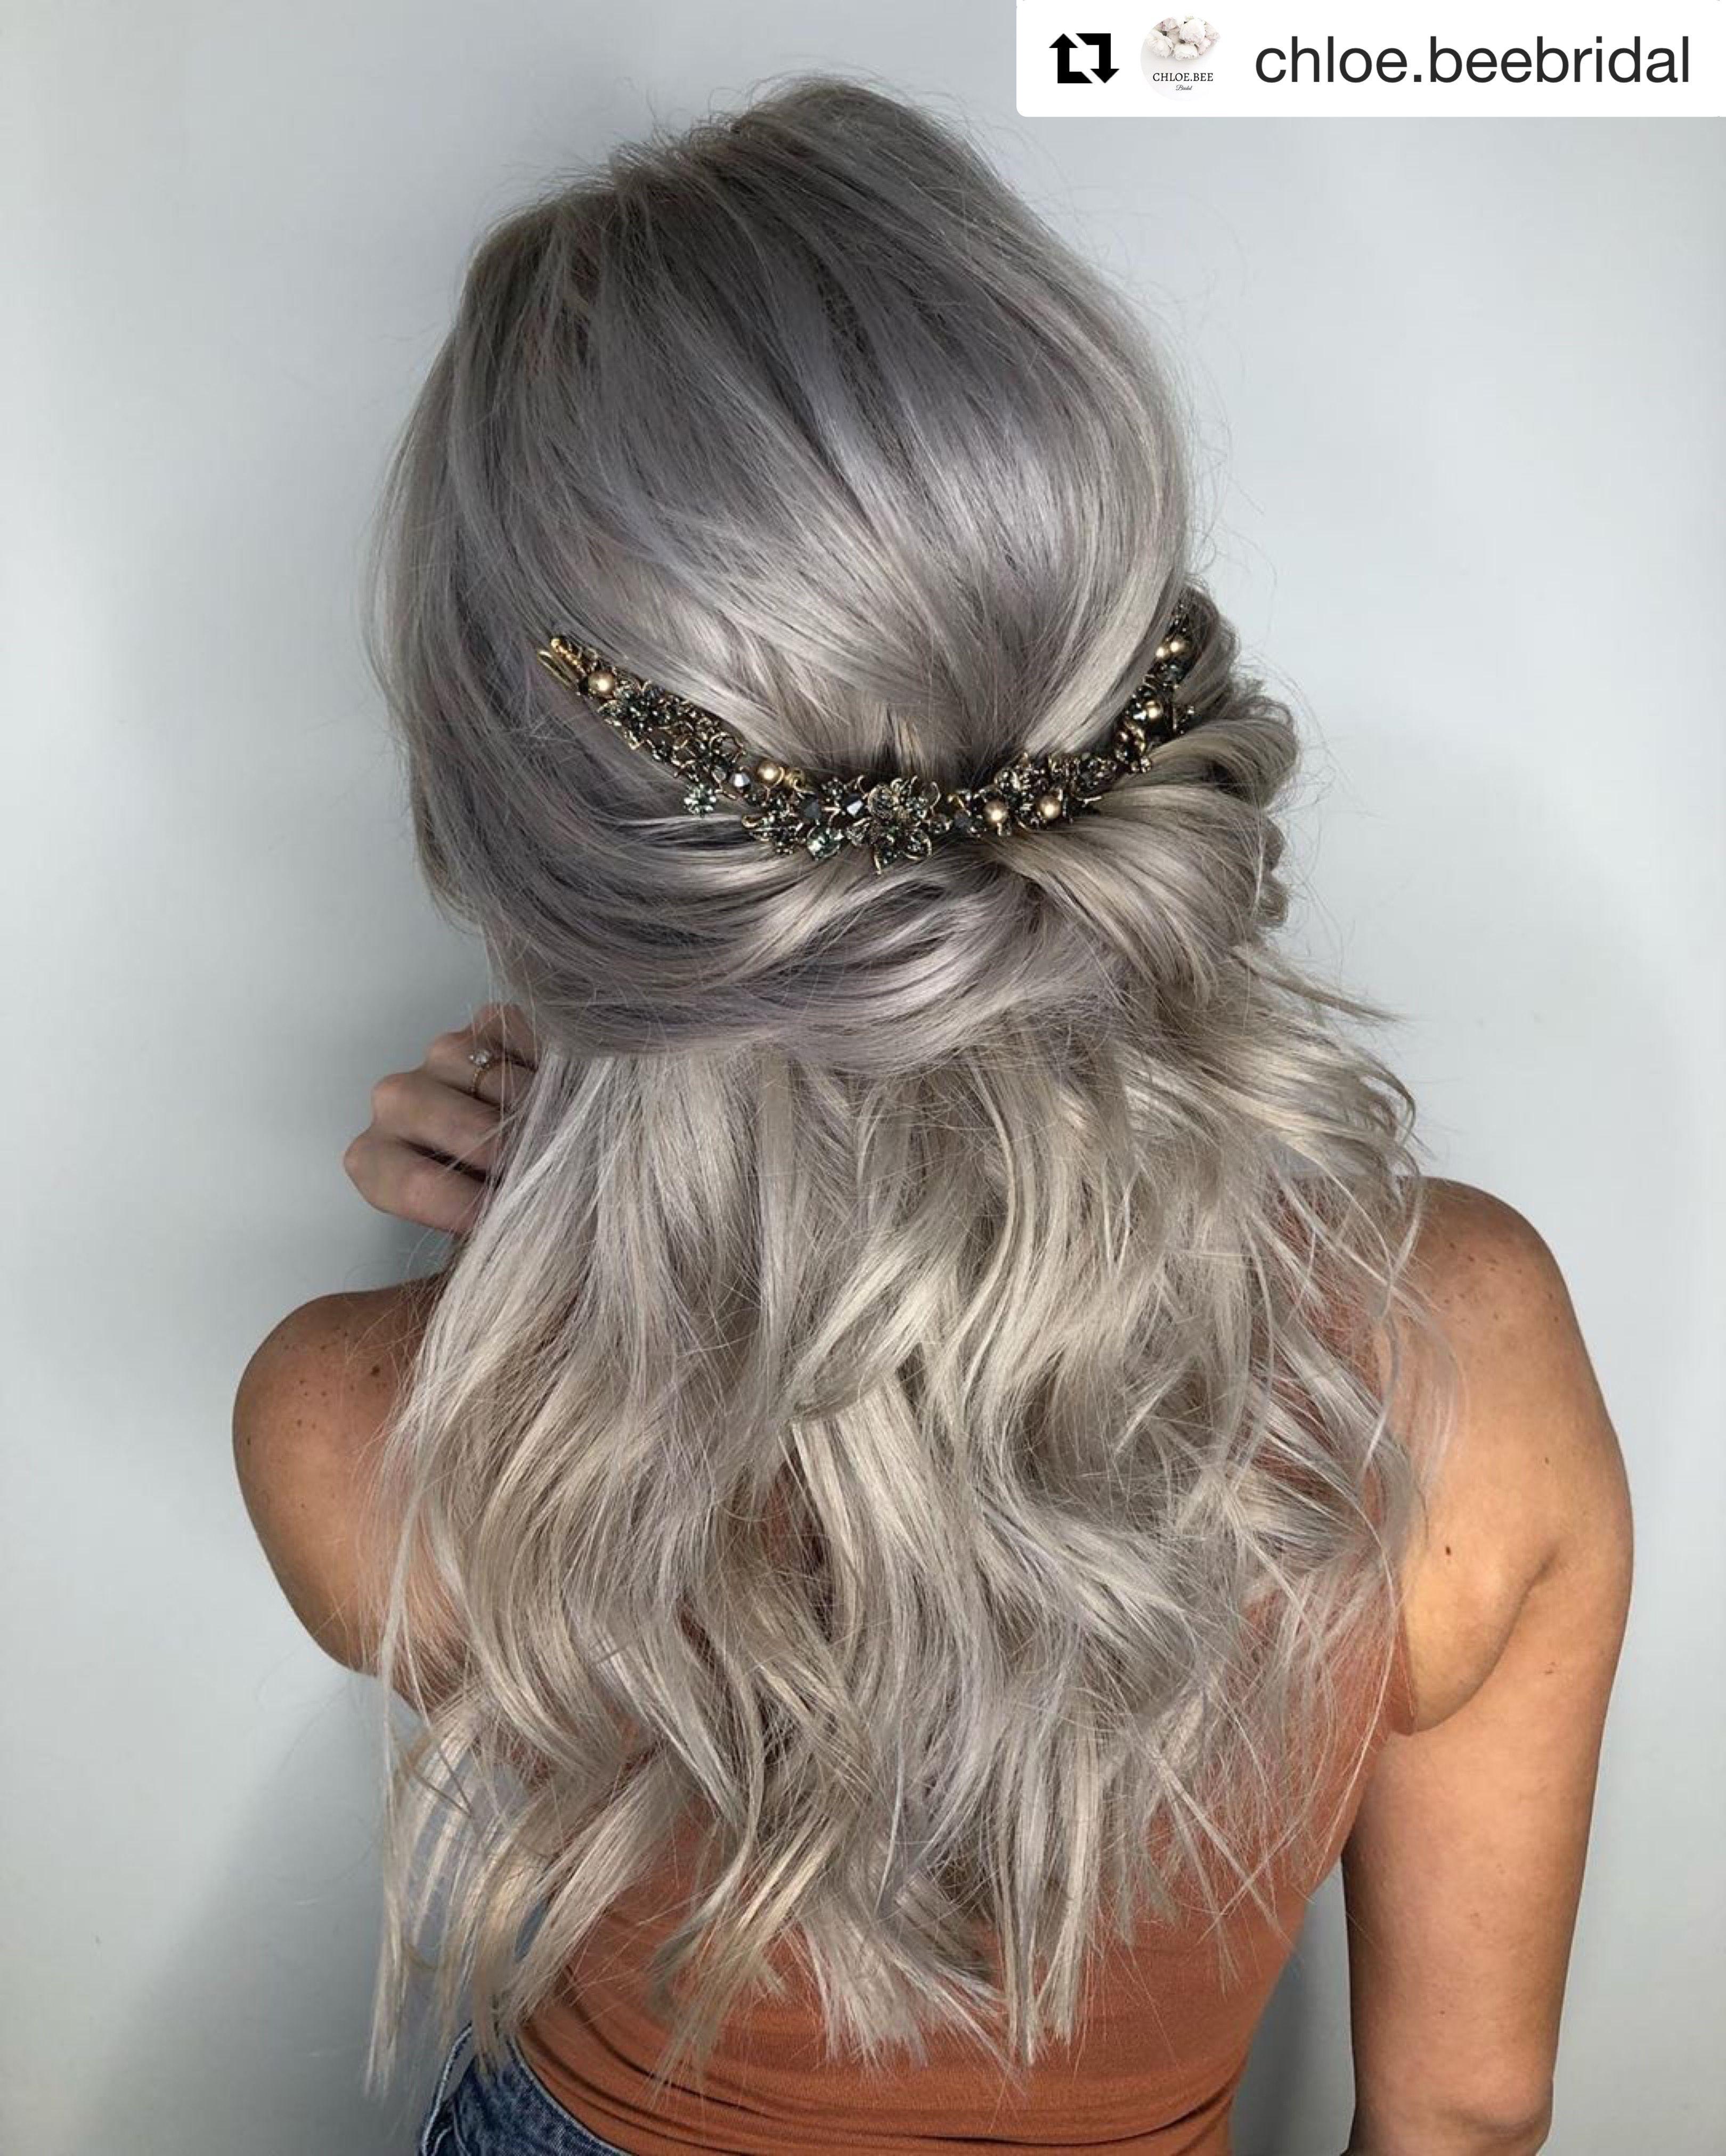 Ash Blonde Wavy Curly Half Up Half Down Wedding Hair Style